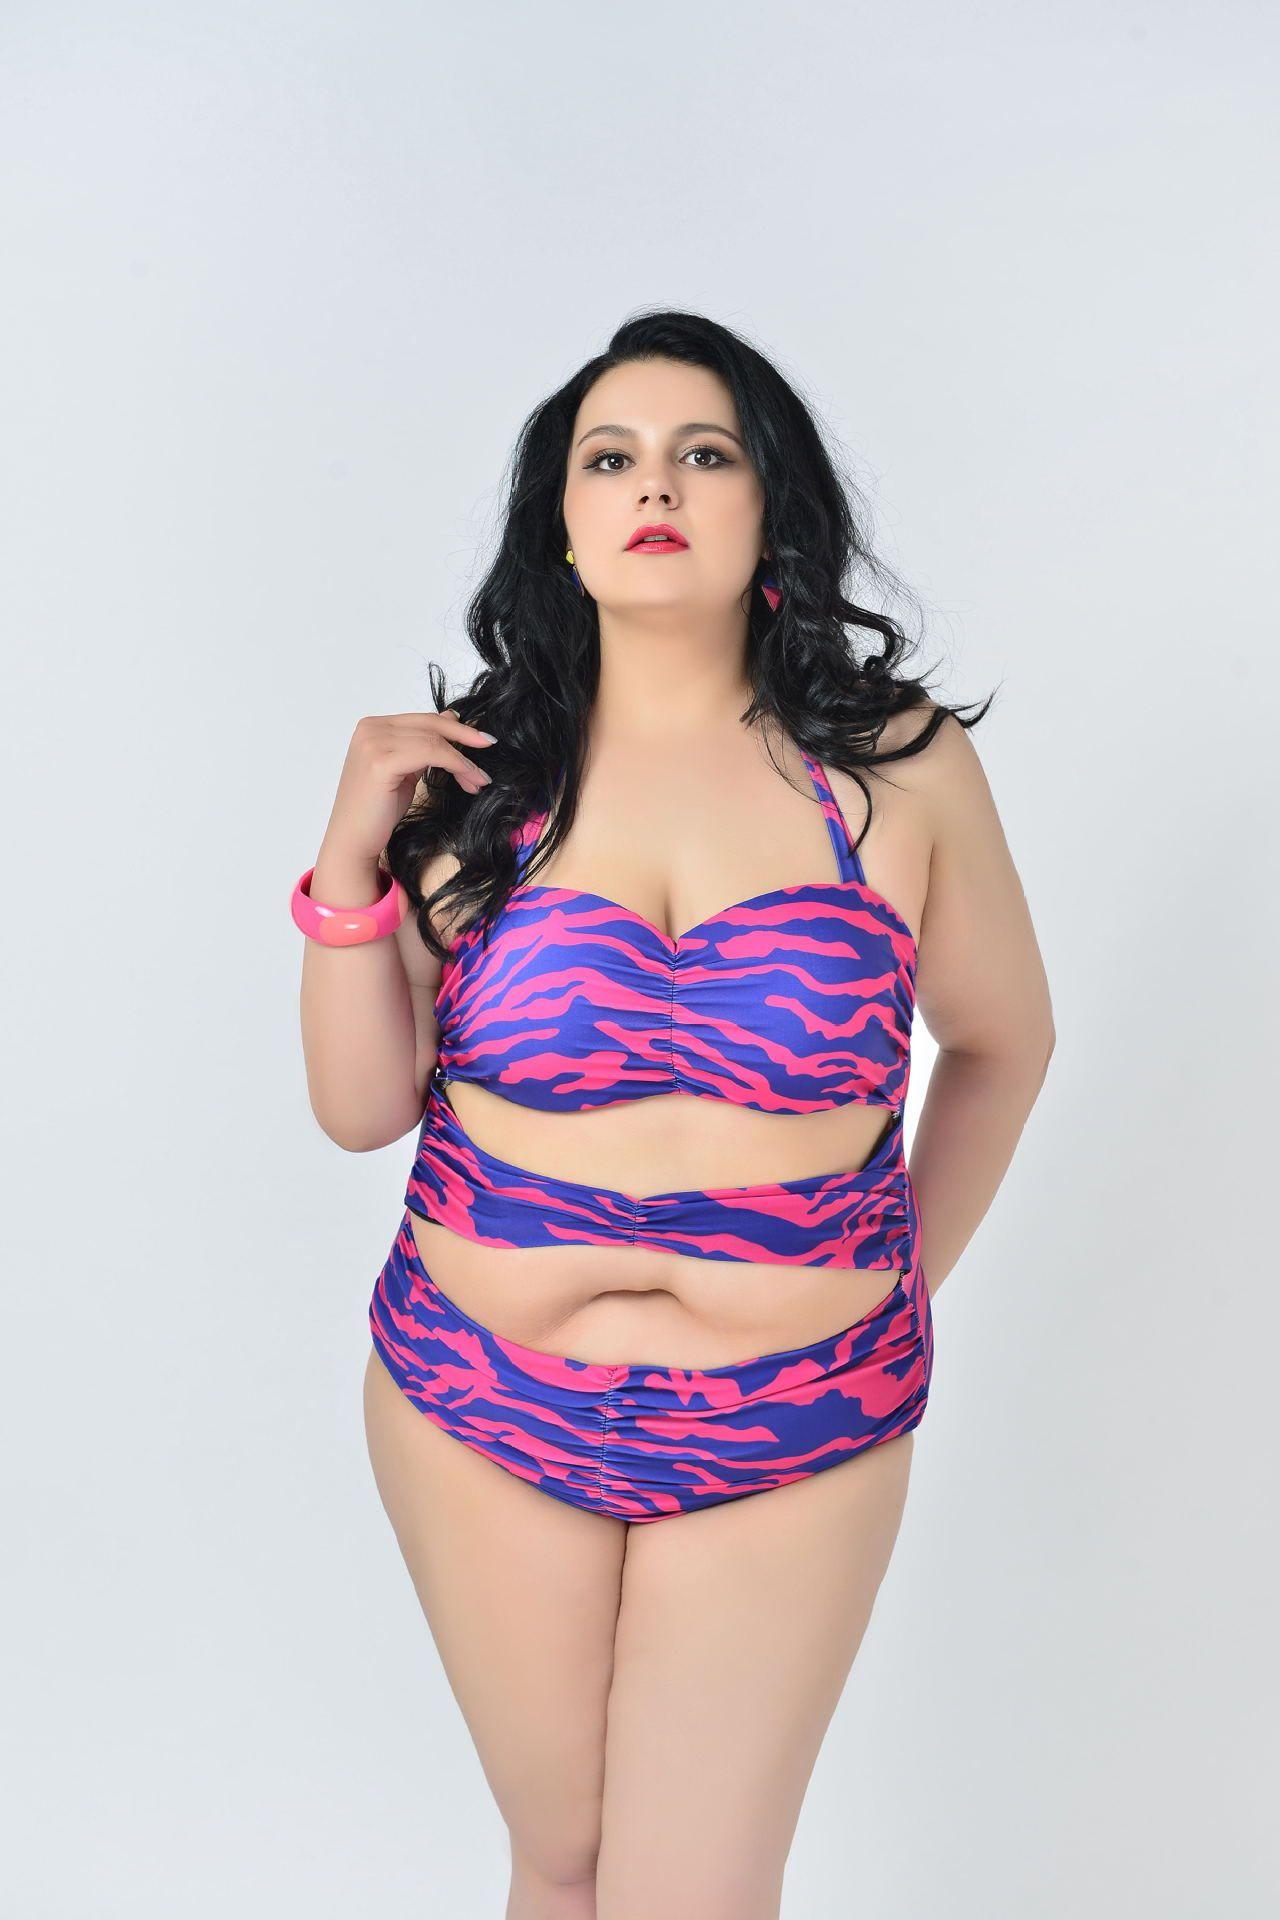 Bikini plus size swimsuit woman